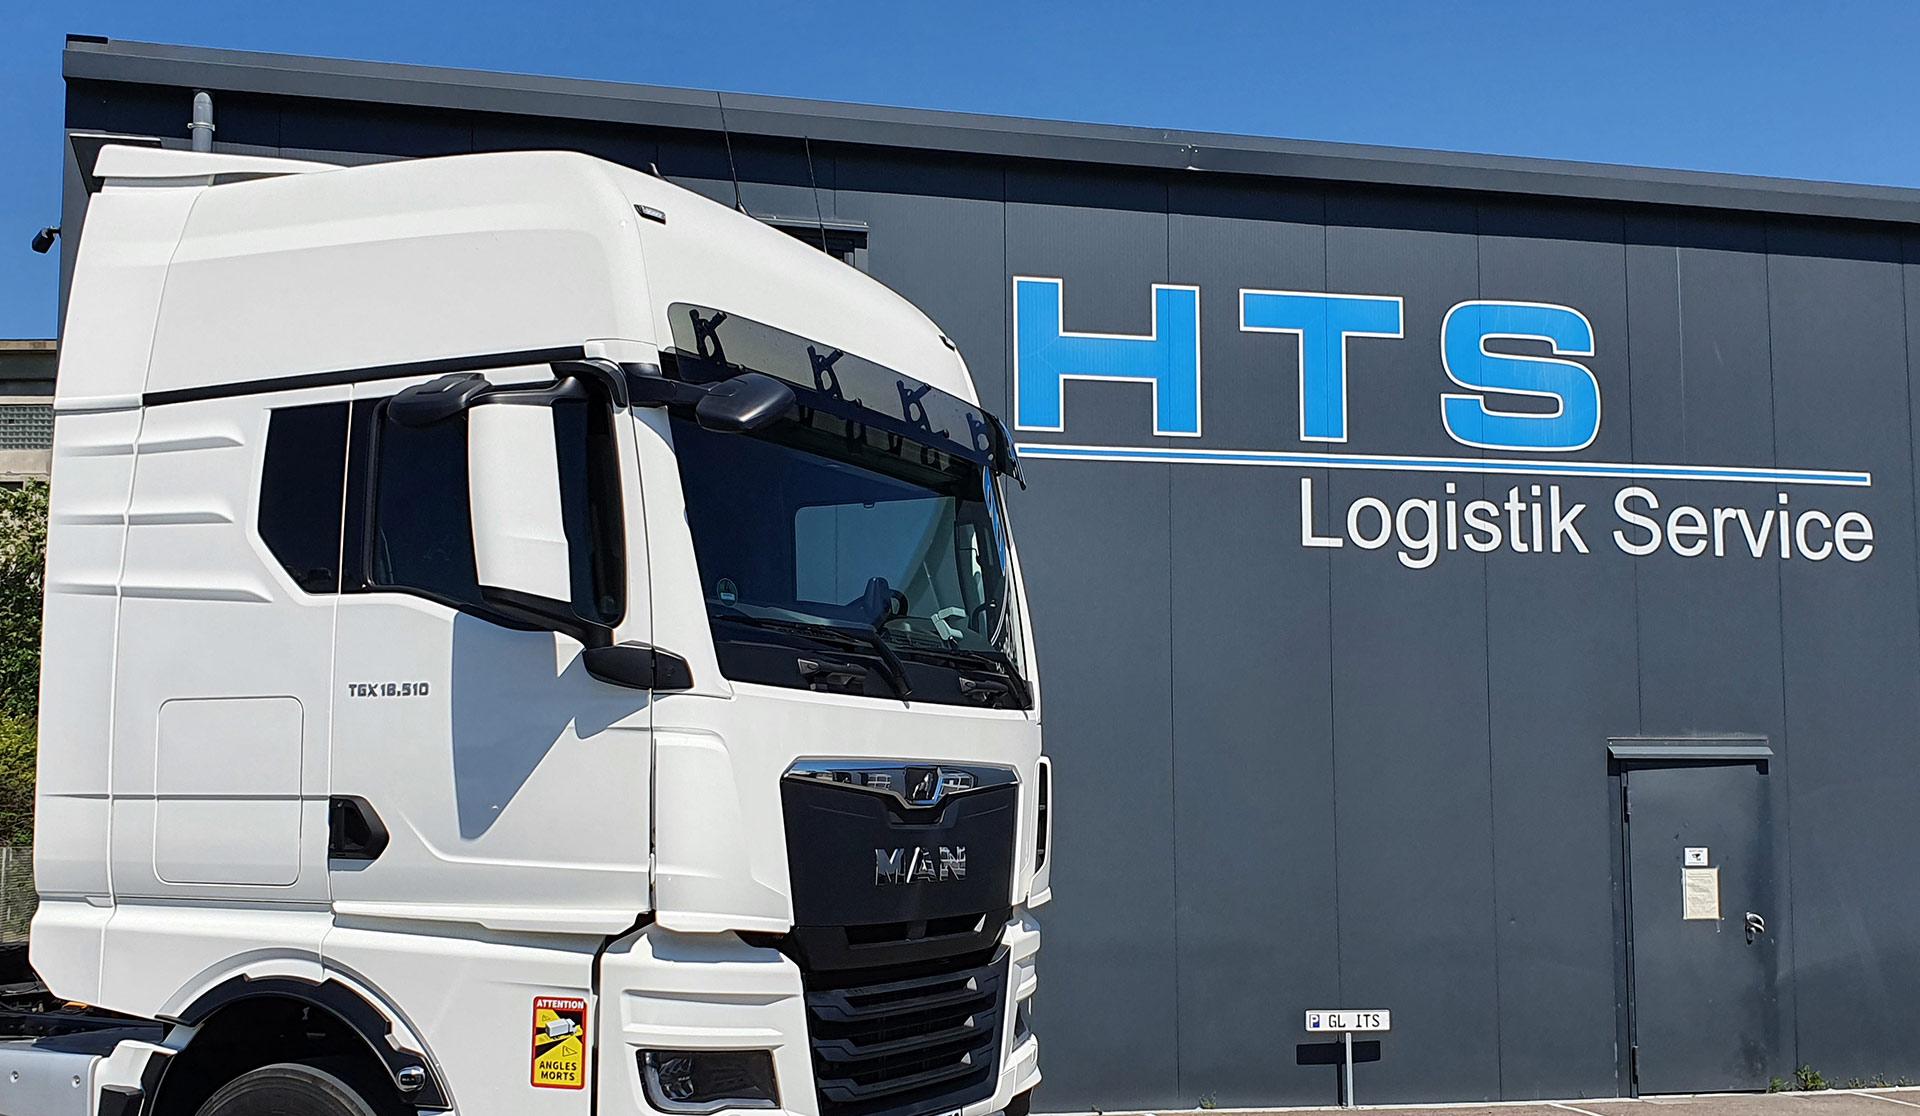 HTS Logistik - Speditionsunternehmen Eschweiler - Fuhrpark